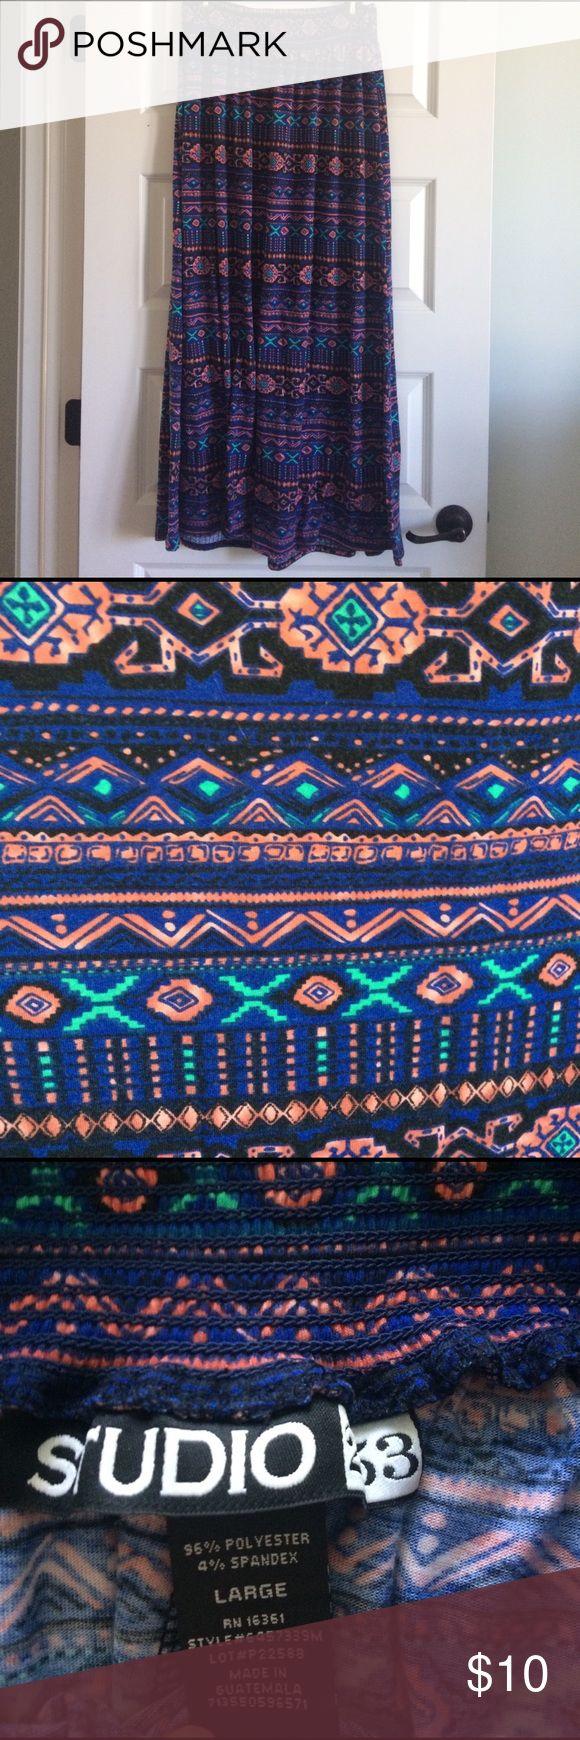 Aztec maxi skirt Comfy Aztec print maxi skirt with elastic waist Skirts Maxi